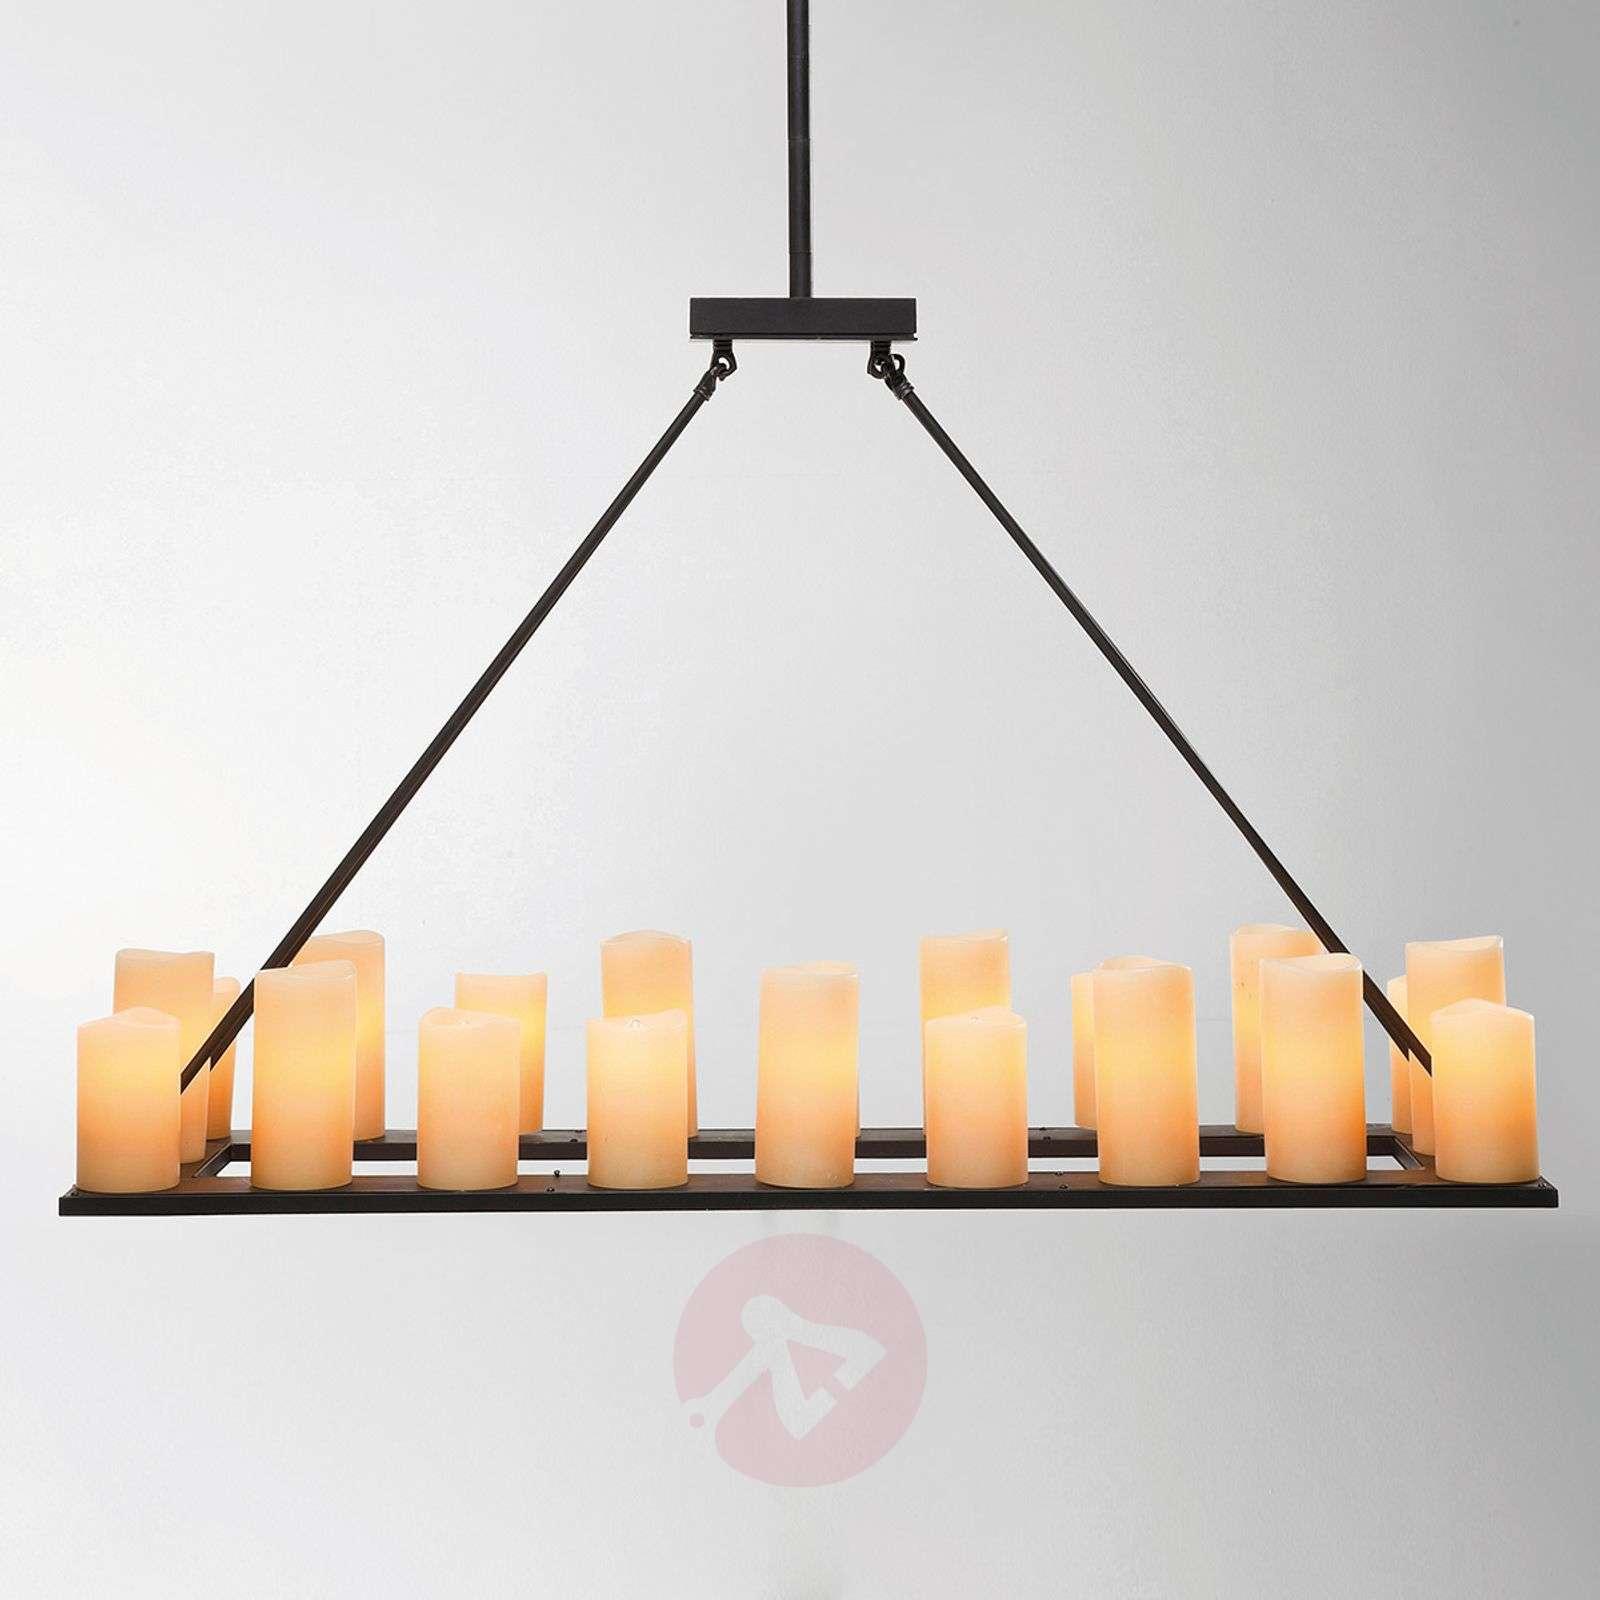 KARE Candle Light 20-bulb hanging light-5517370-01